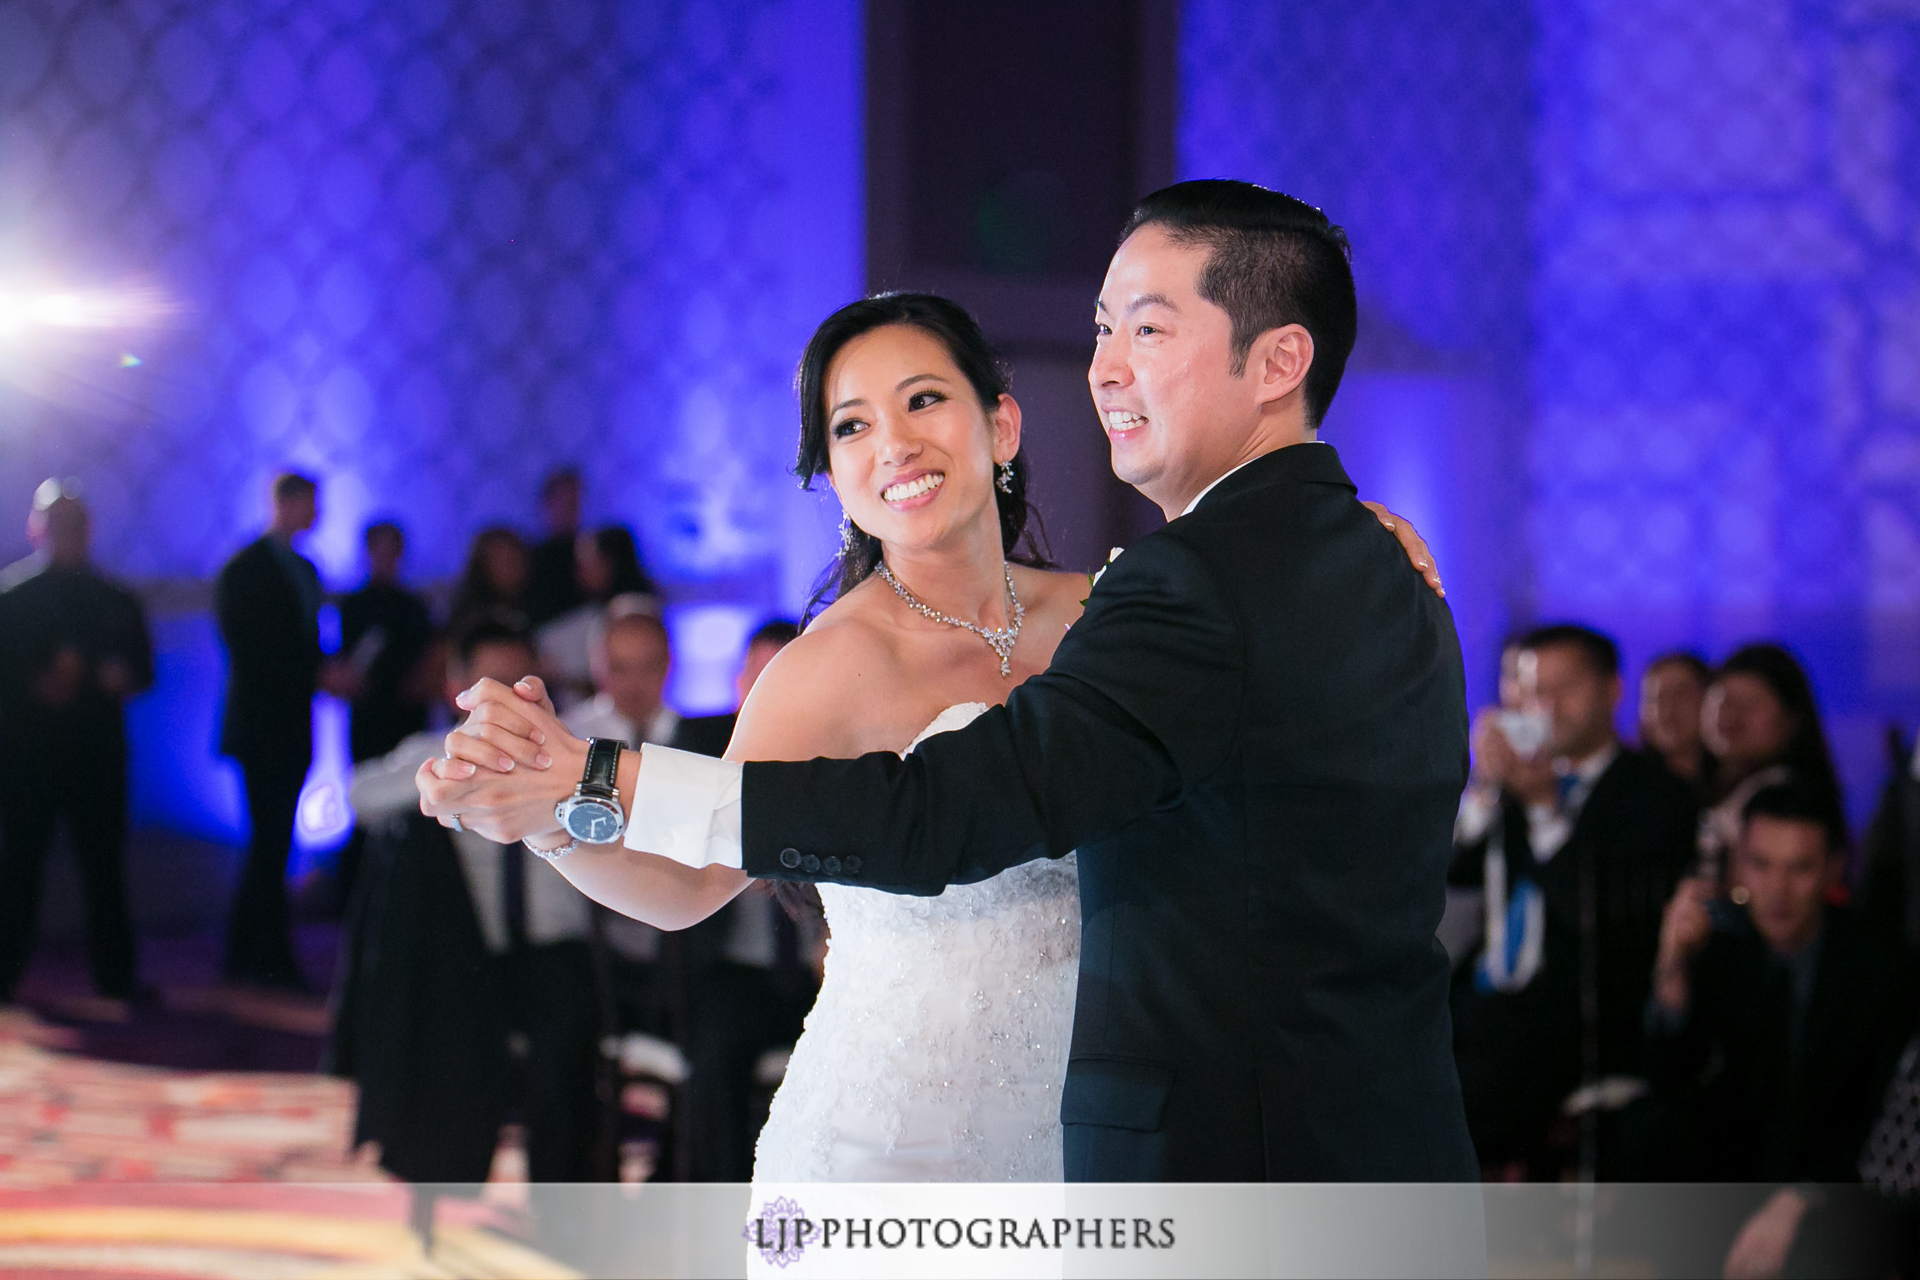 27-jw-marriott-los-angeles-wedding-photographer-wedding-reception-photos